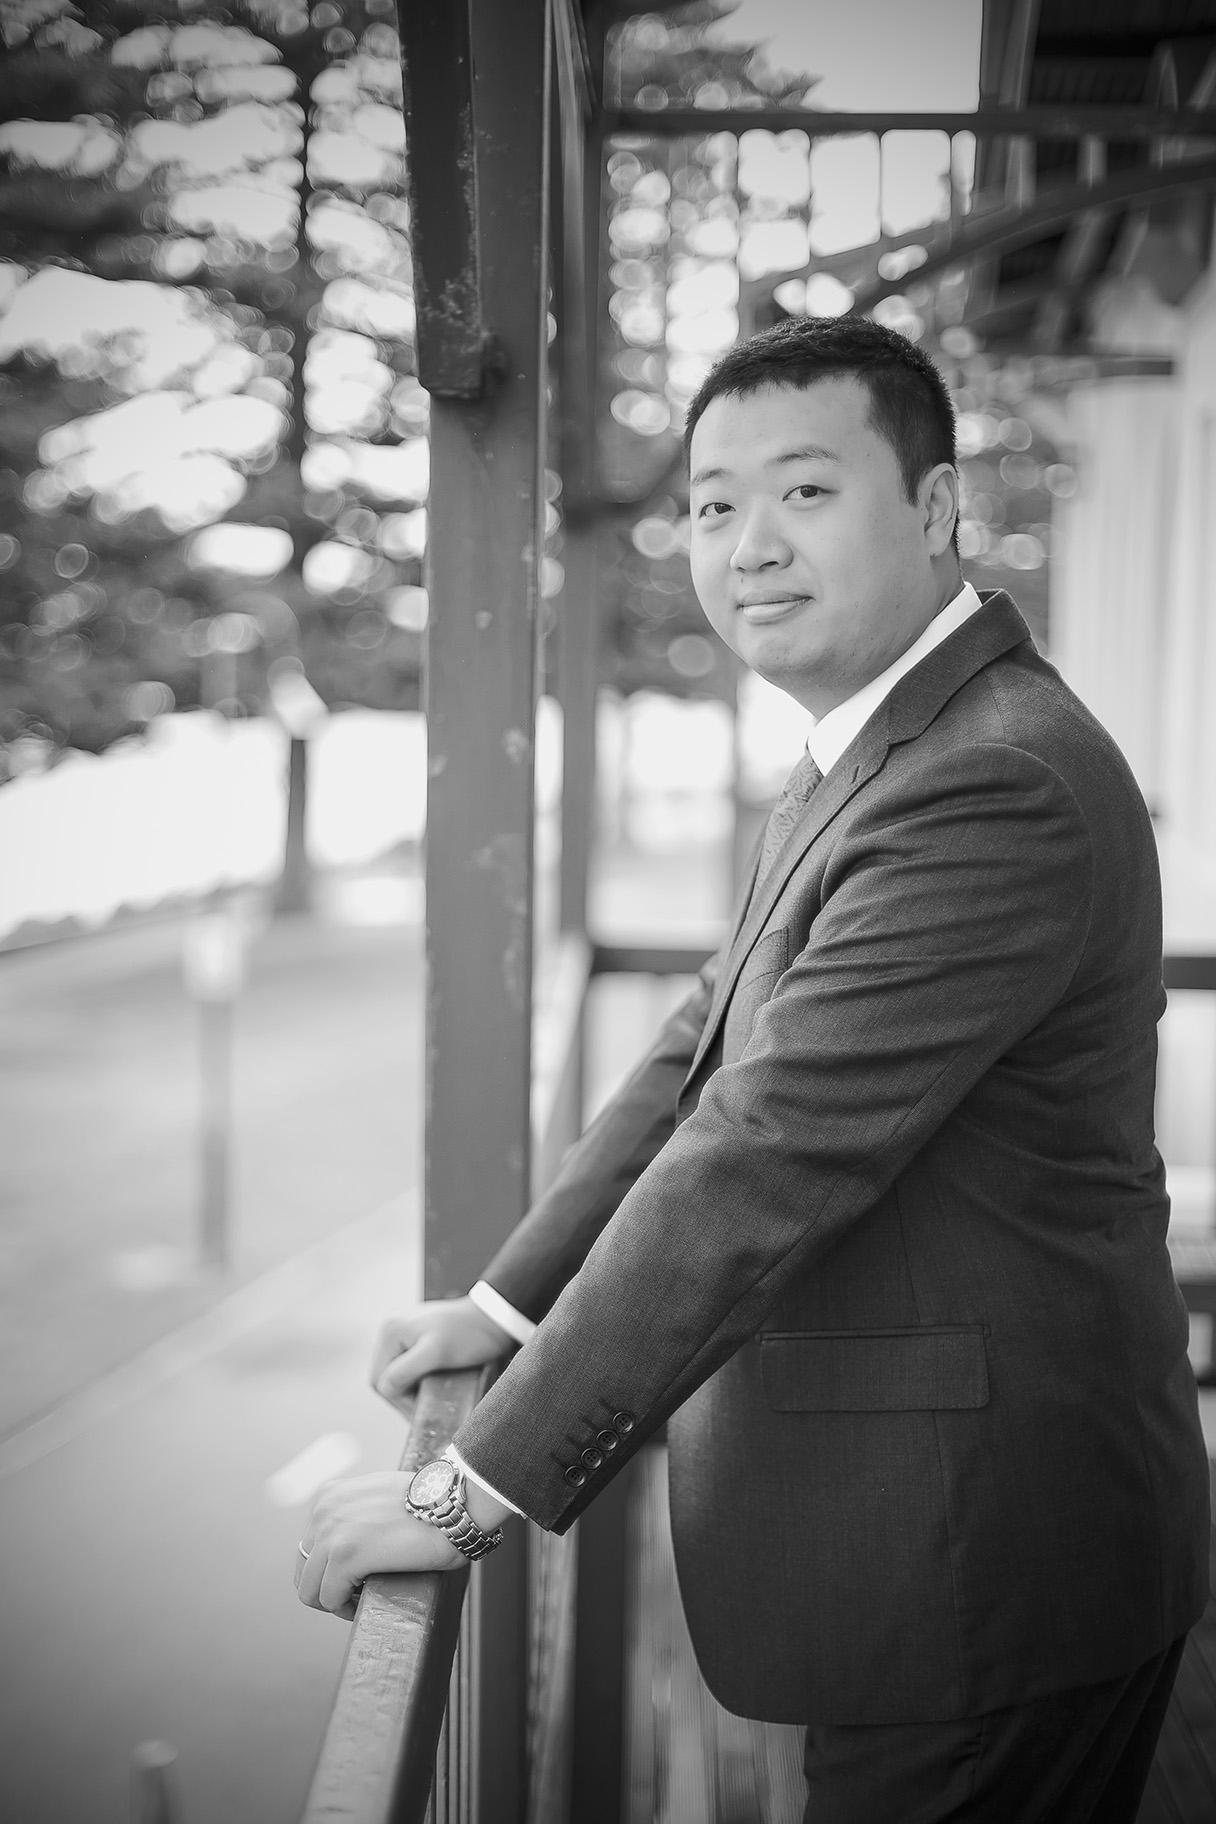 Black and white film style groom preparation photo 1